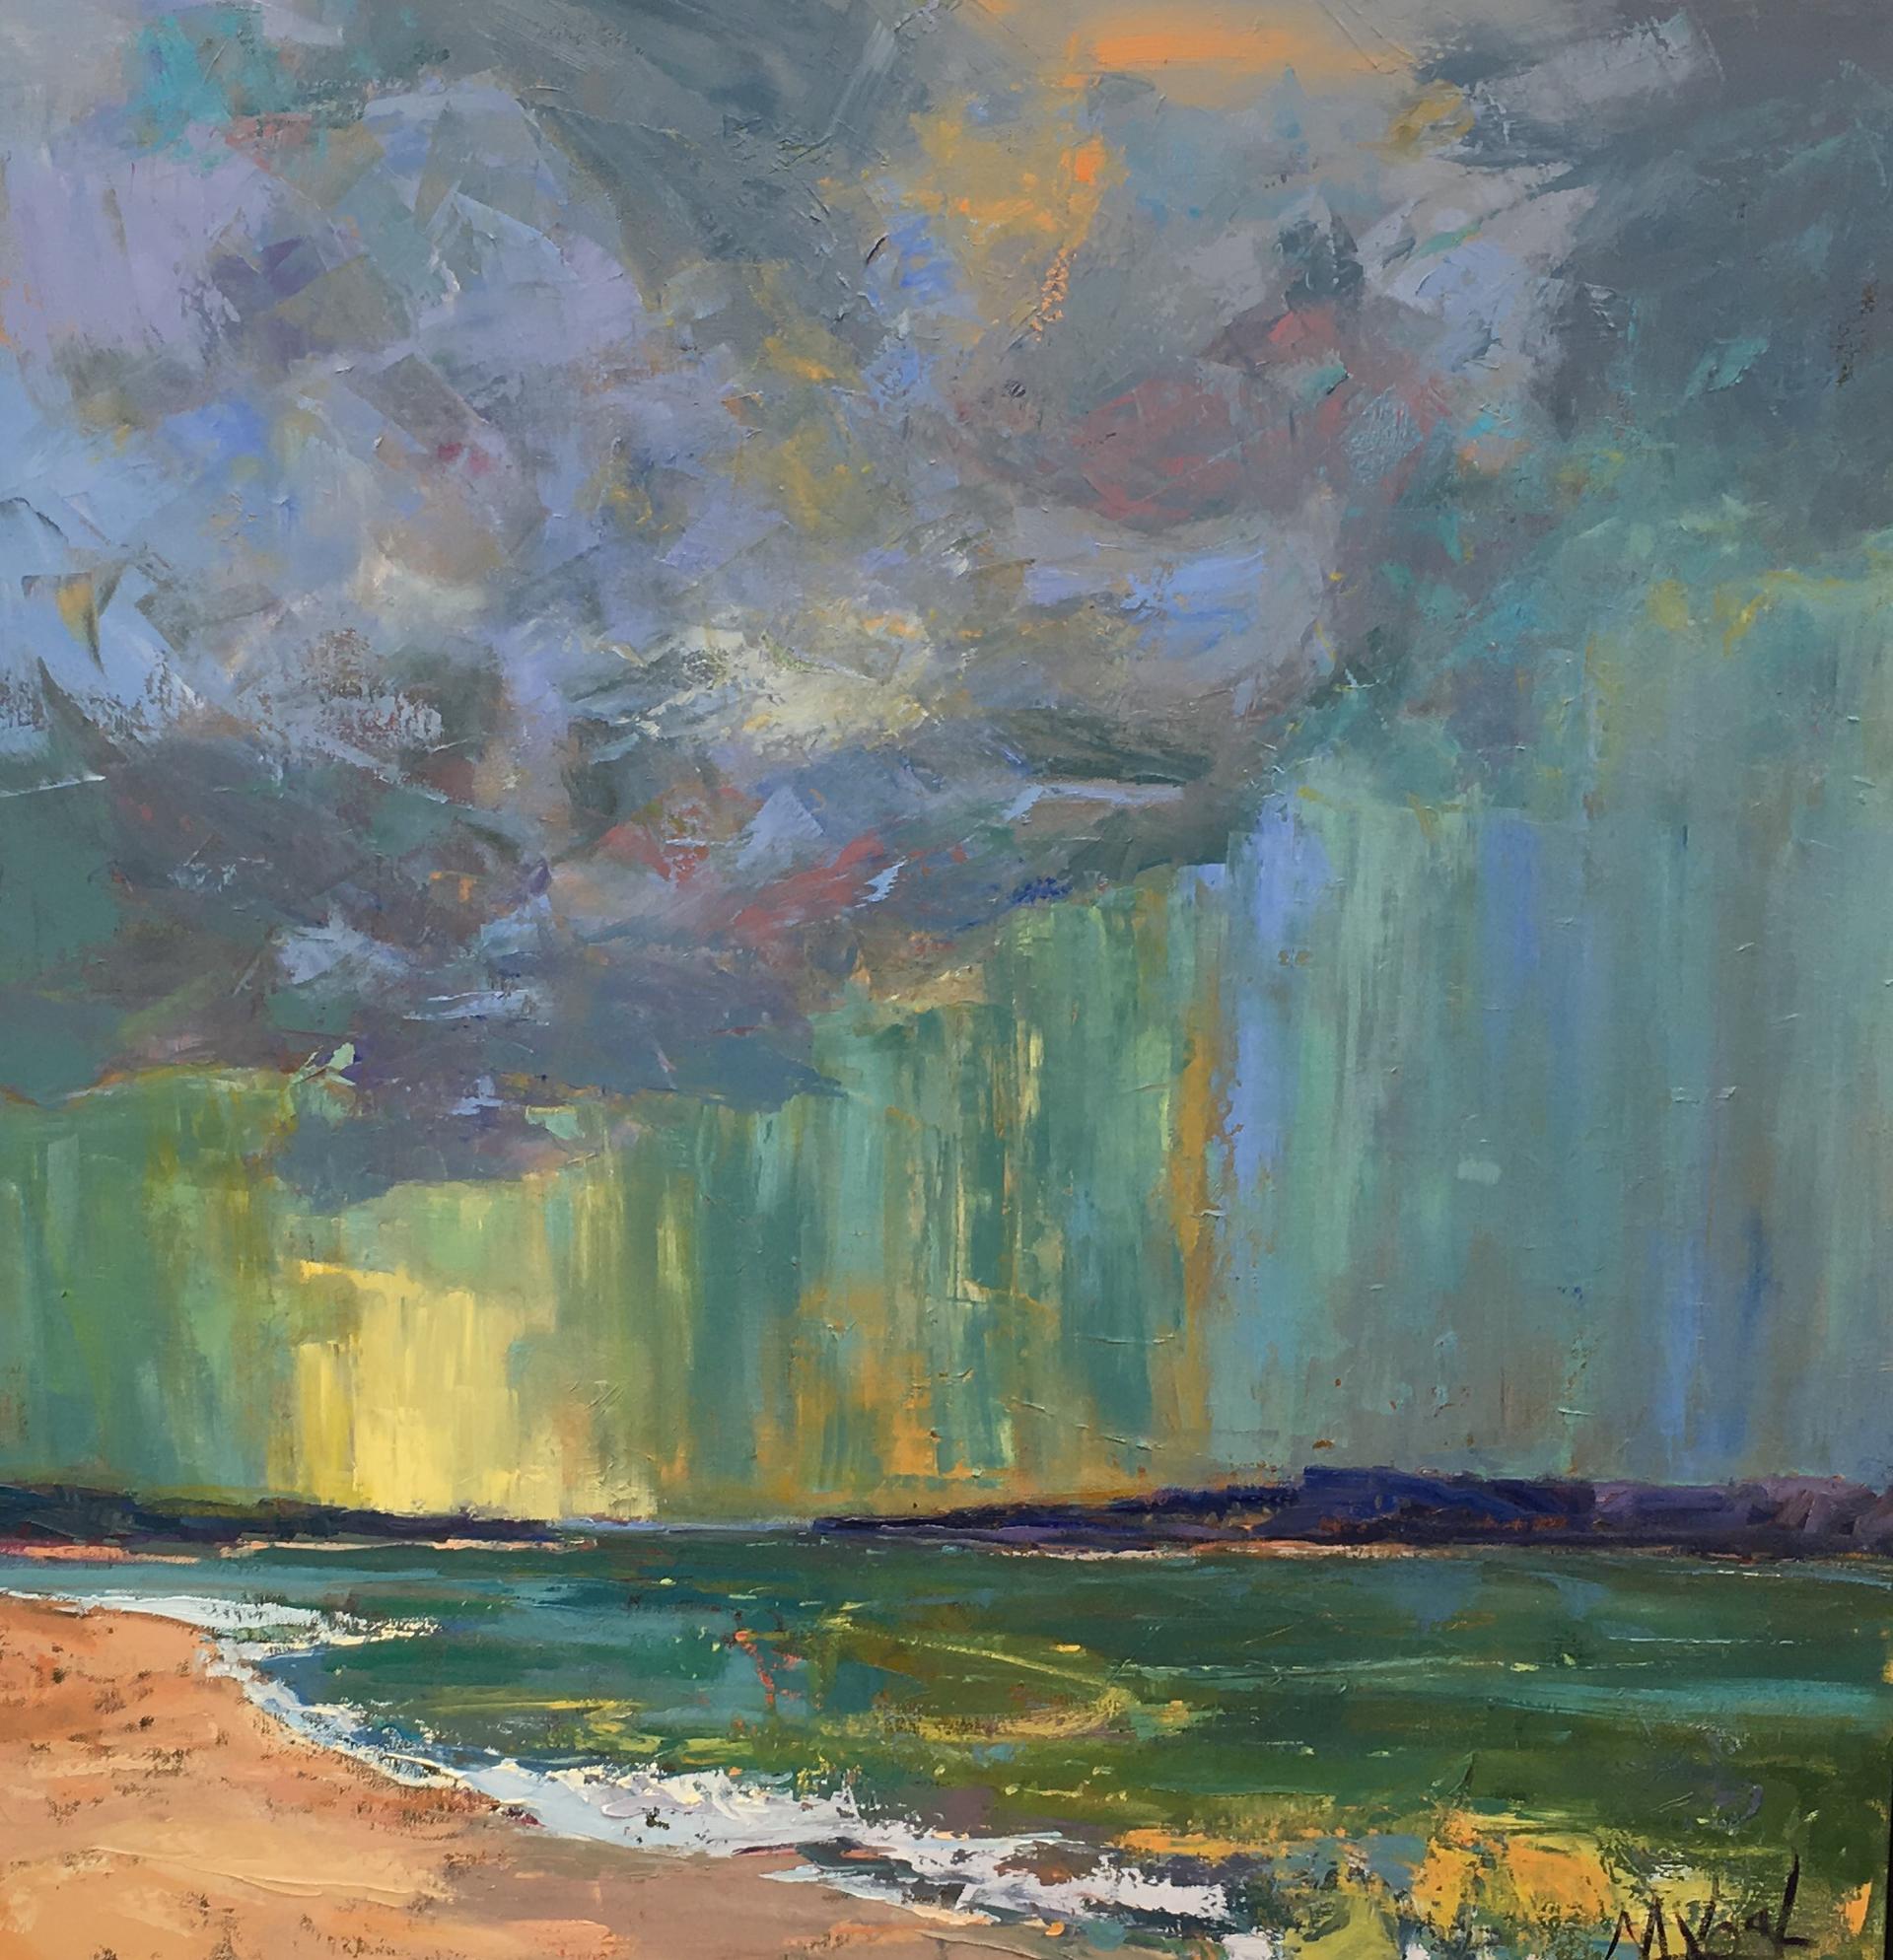 Light of Passage by Marissa Vogl